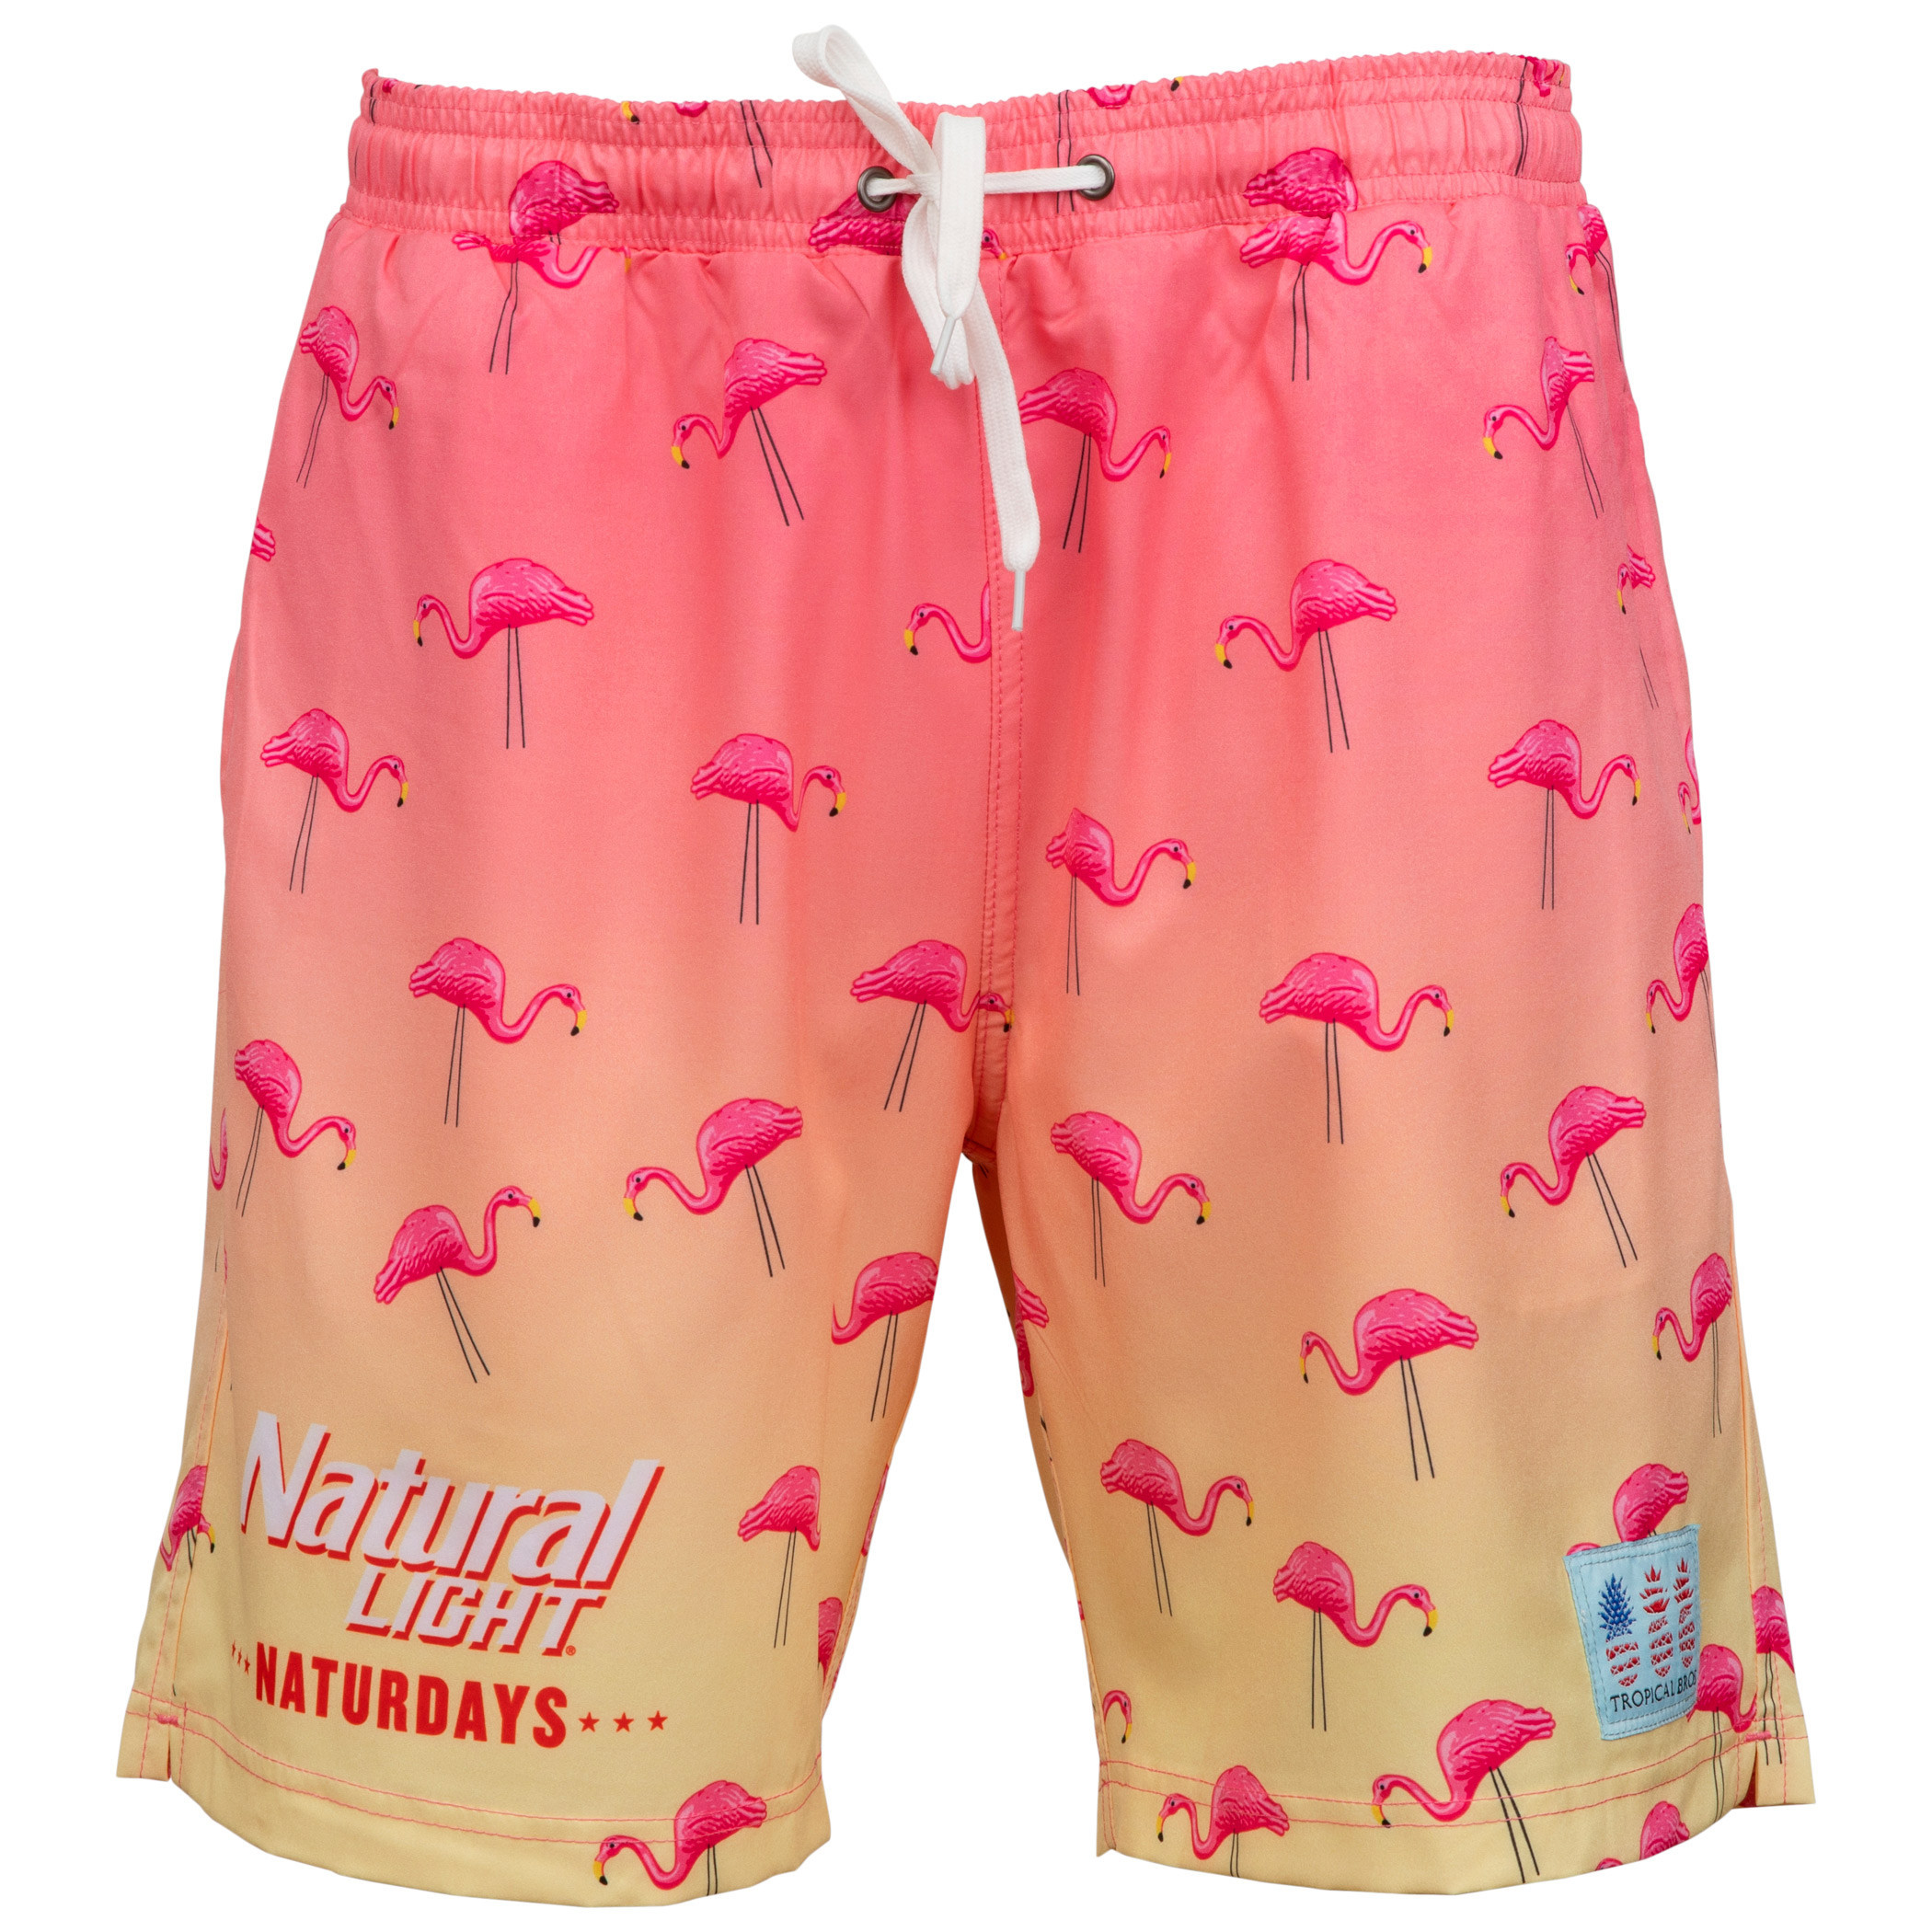 Naturdays Natural Light Flamingo Swimsuit